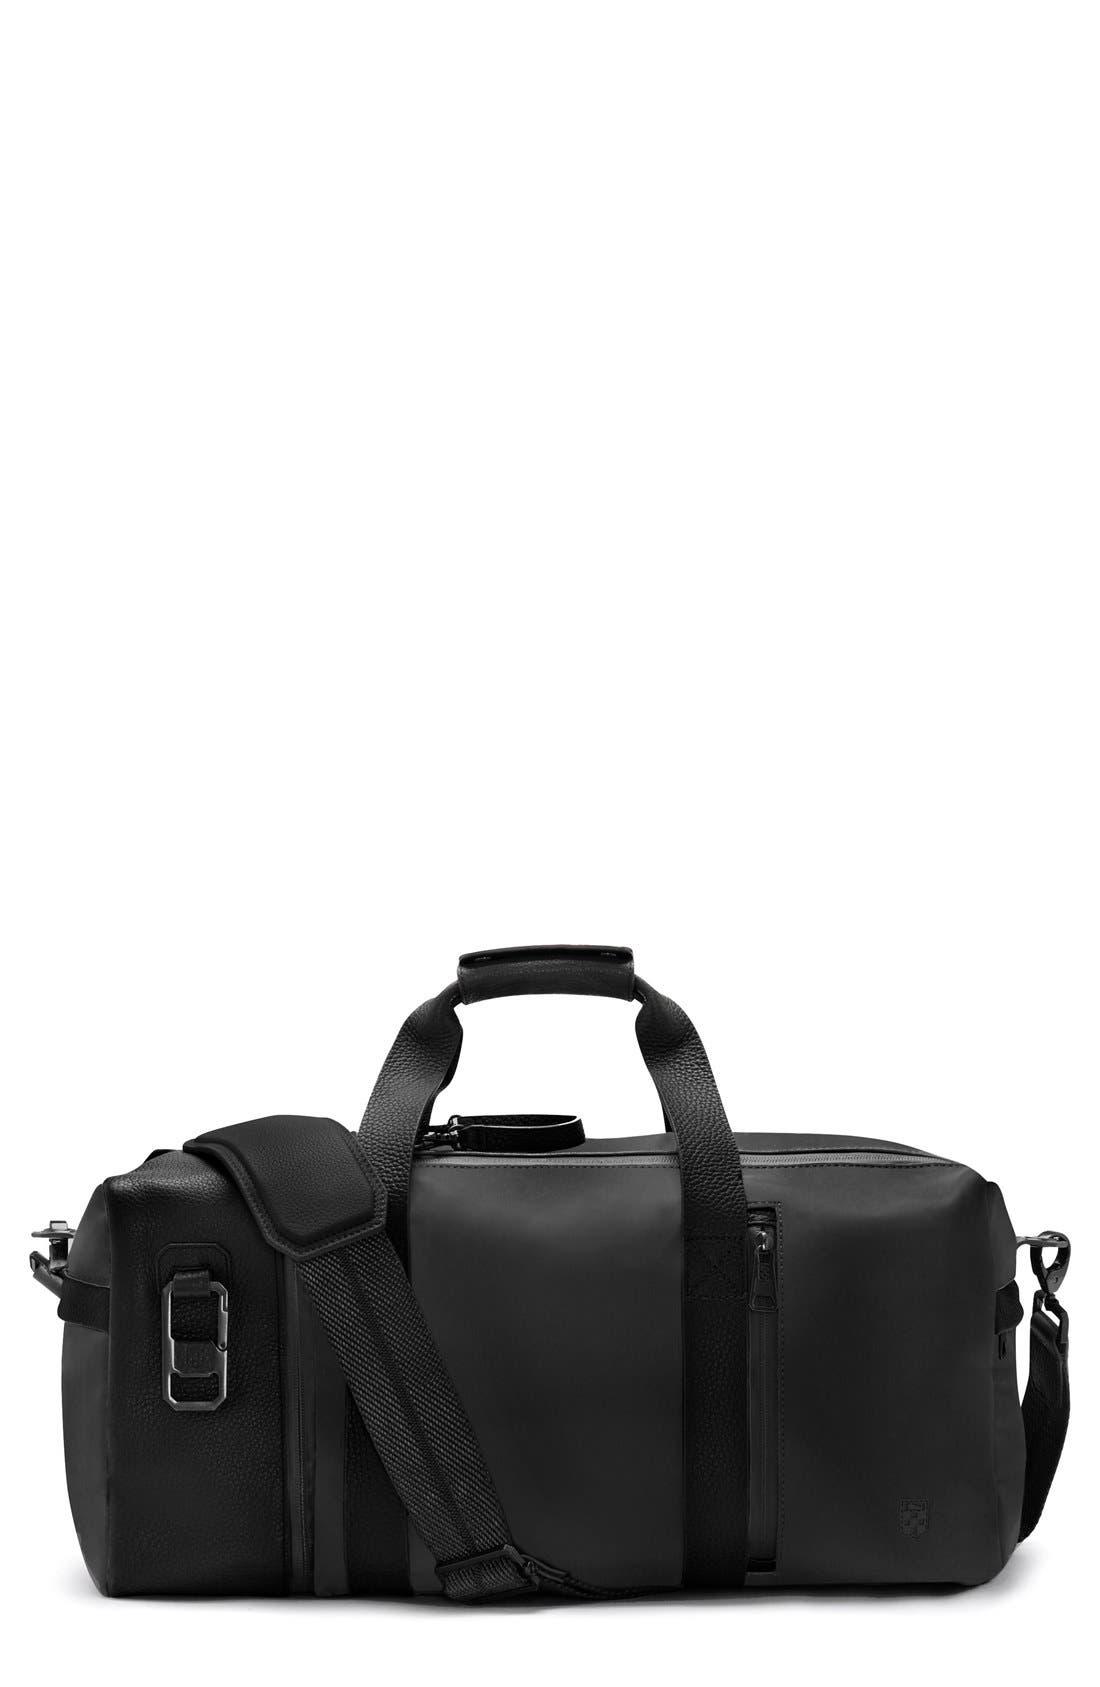 Main Image - Vince Camuto 'Mestr' Duffel Bag